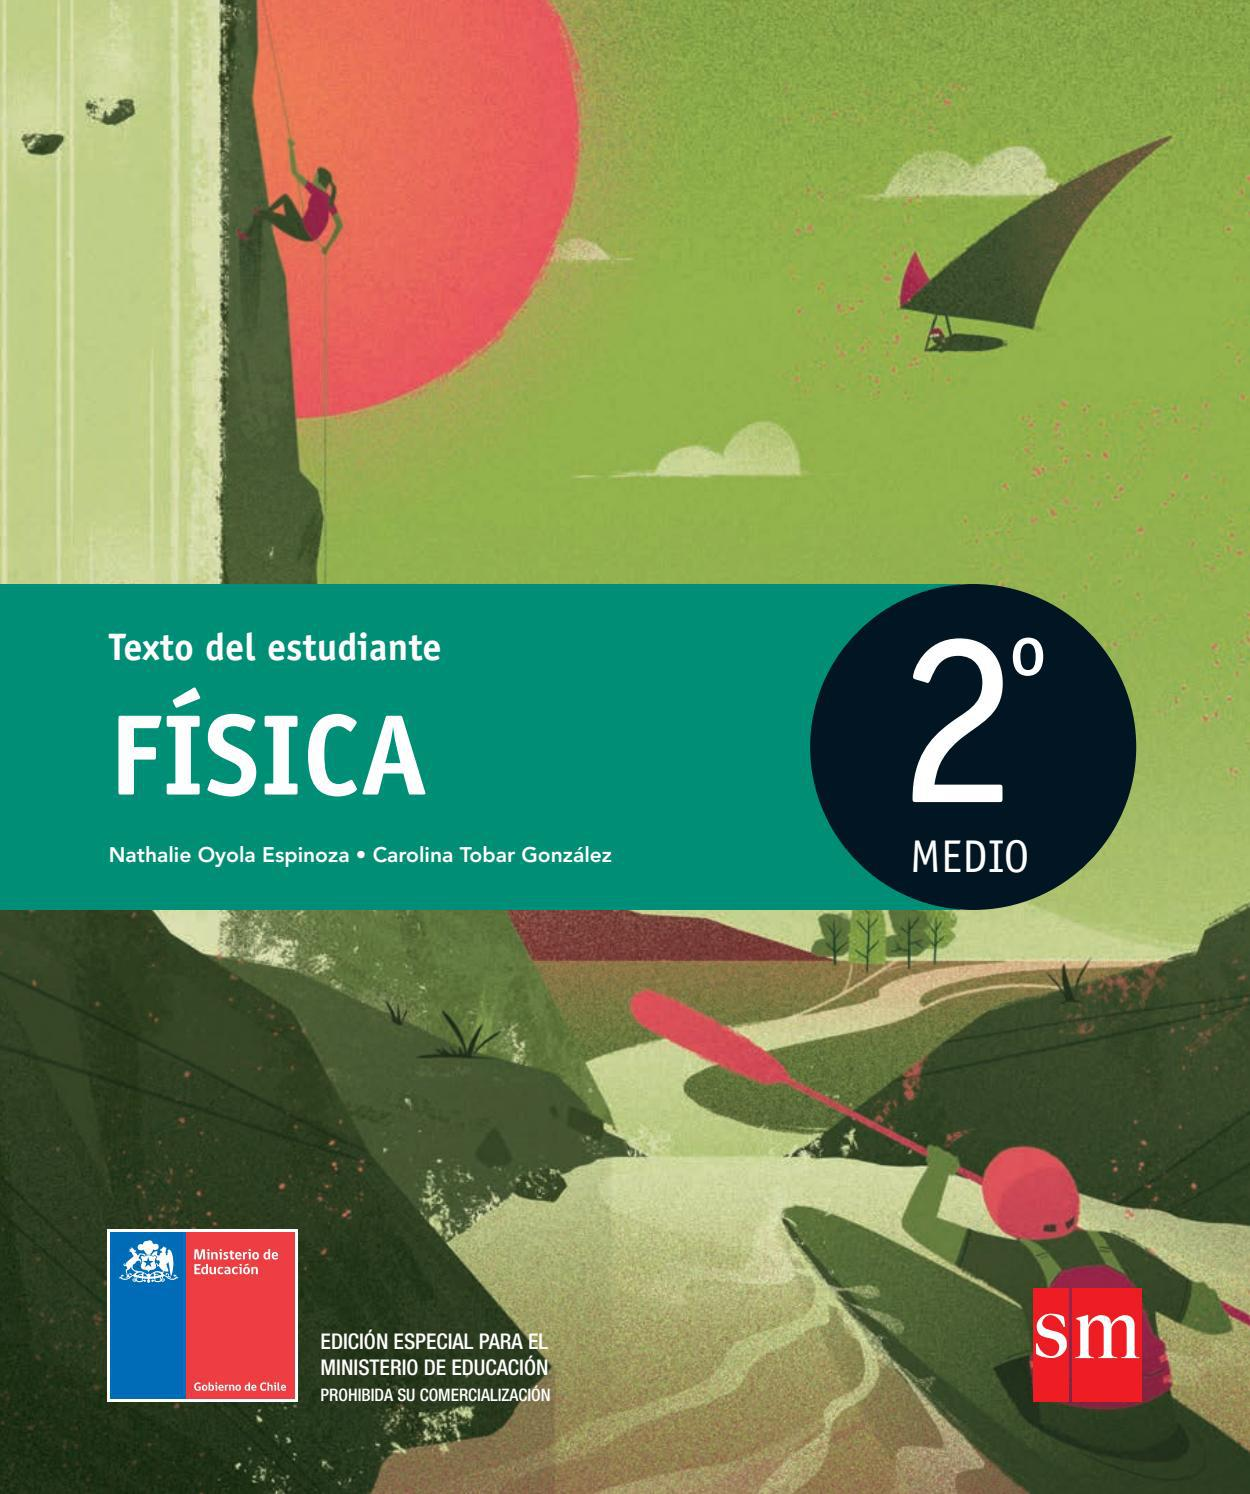 Textos escolares Fisica 2 medio by Flores Manuel - issuu